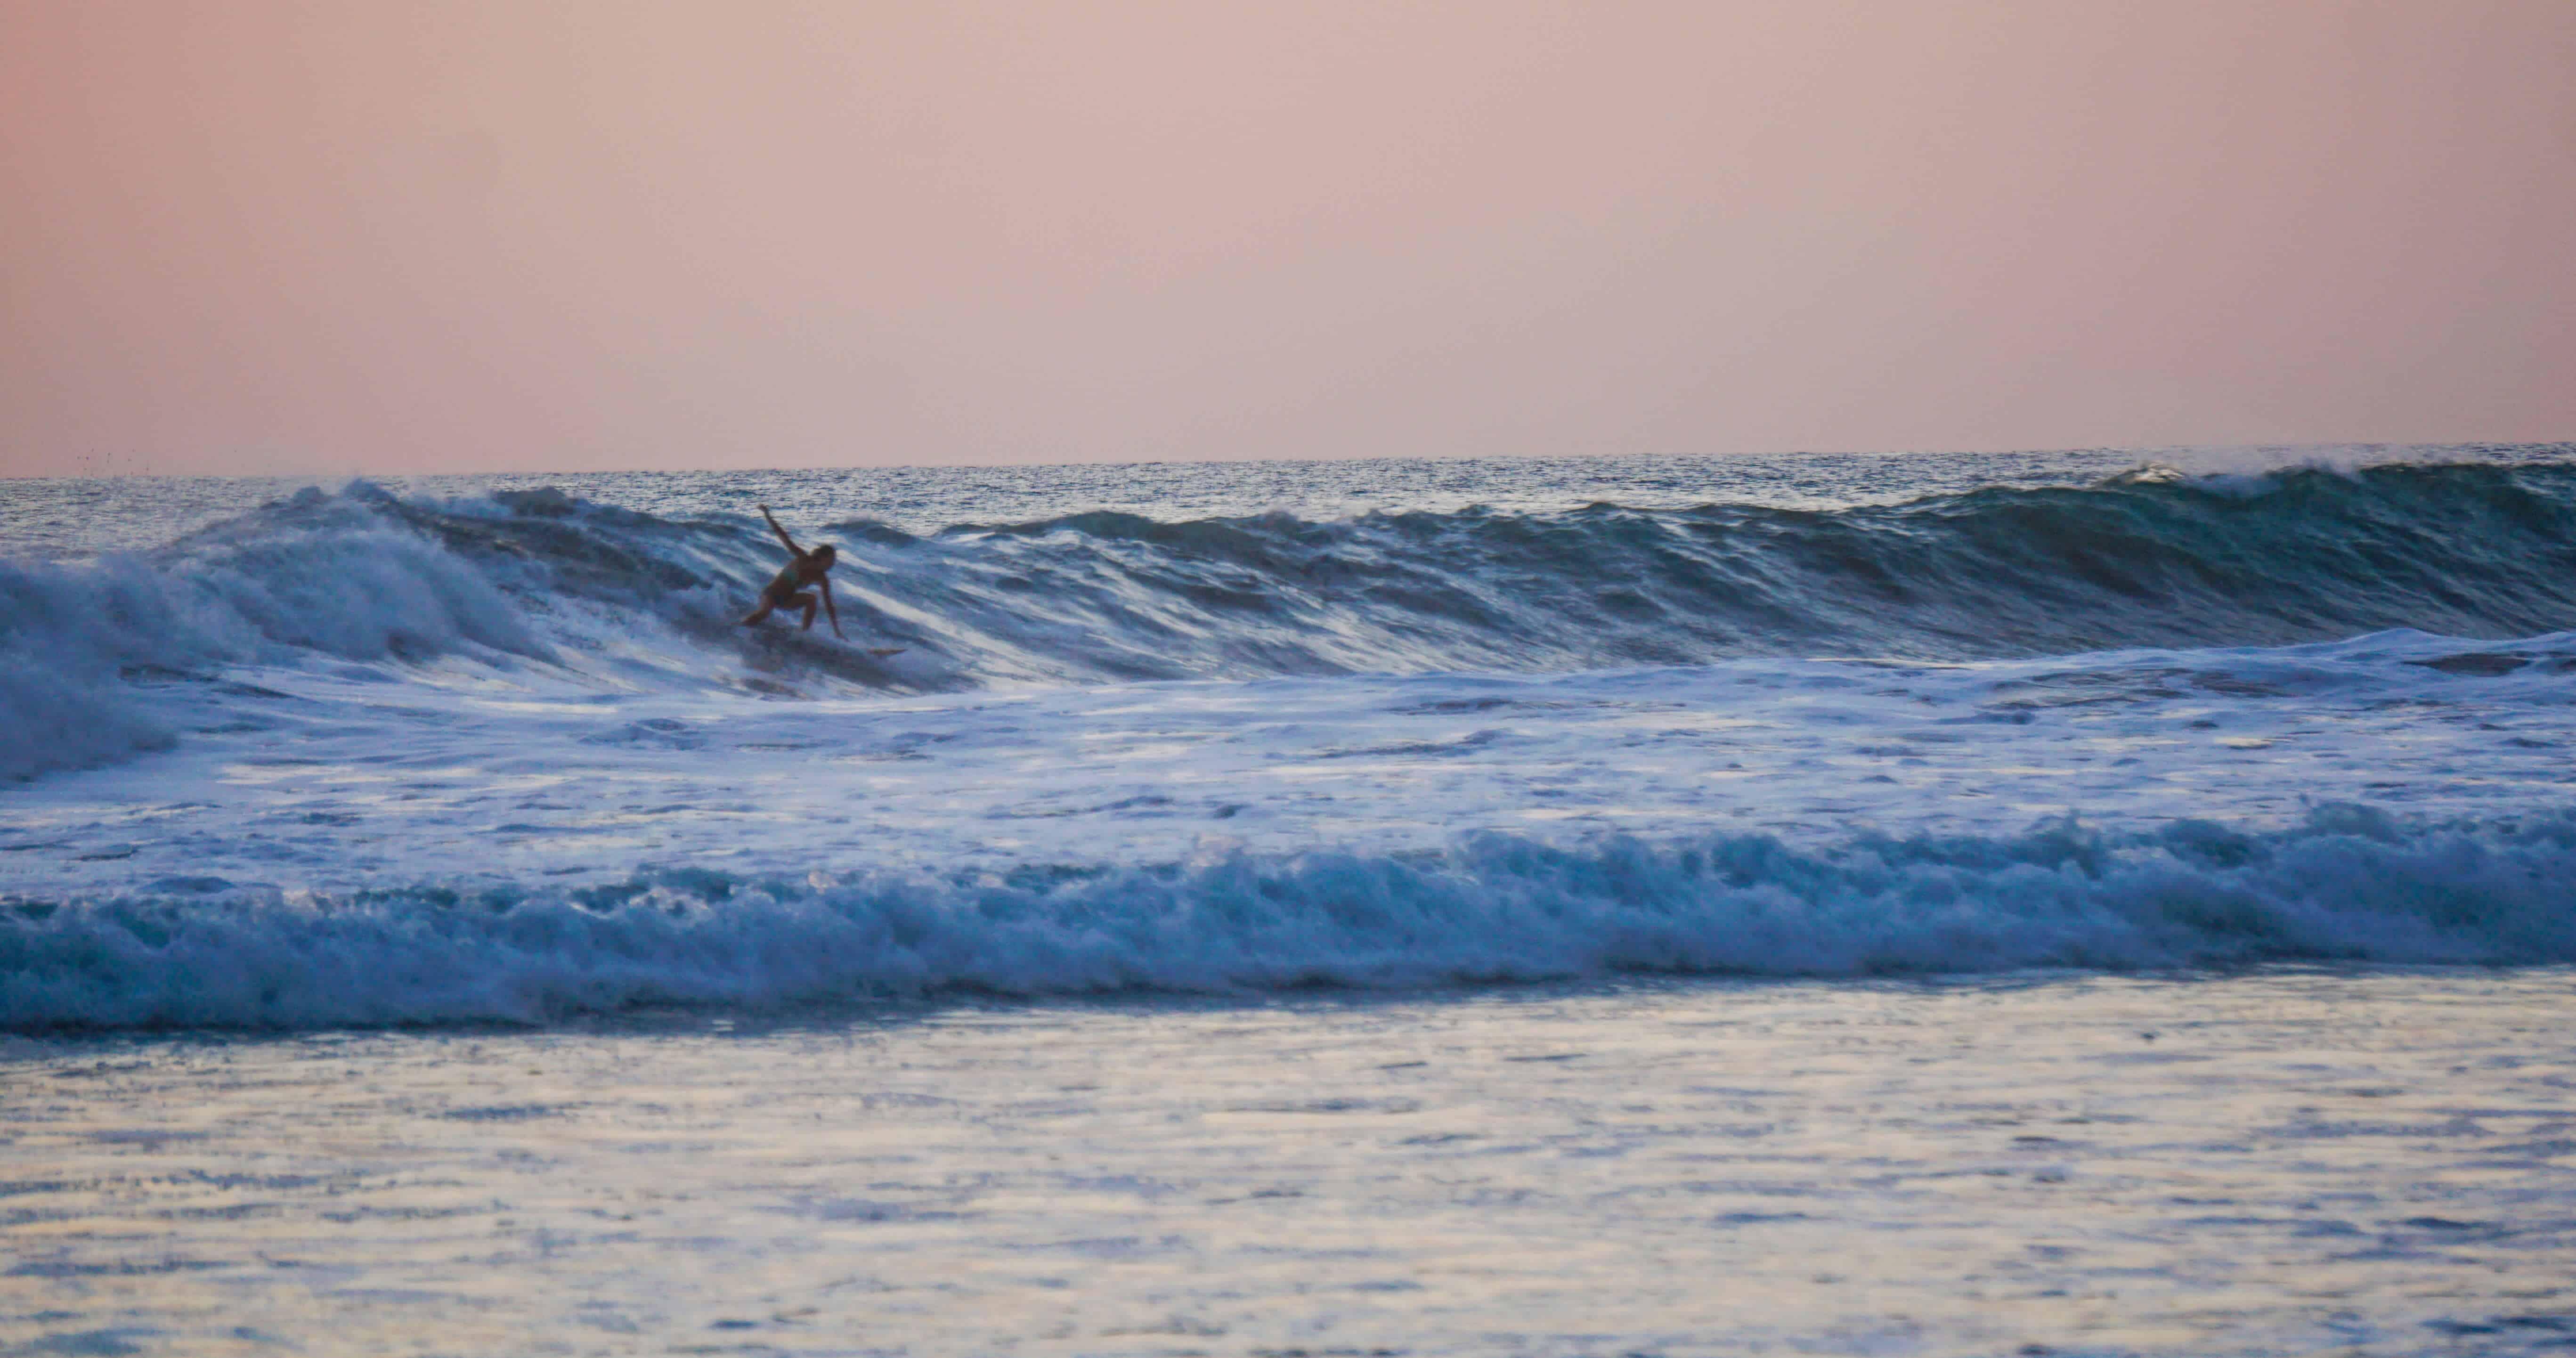 Surfer in Santa Teresa